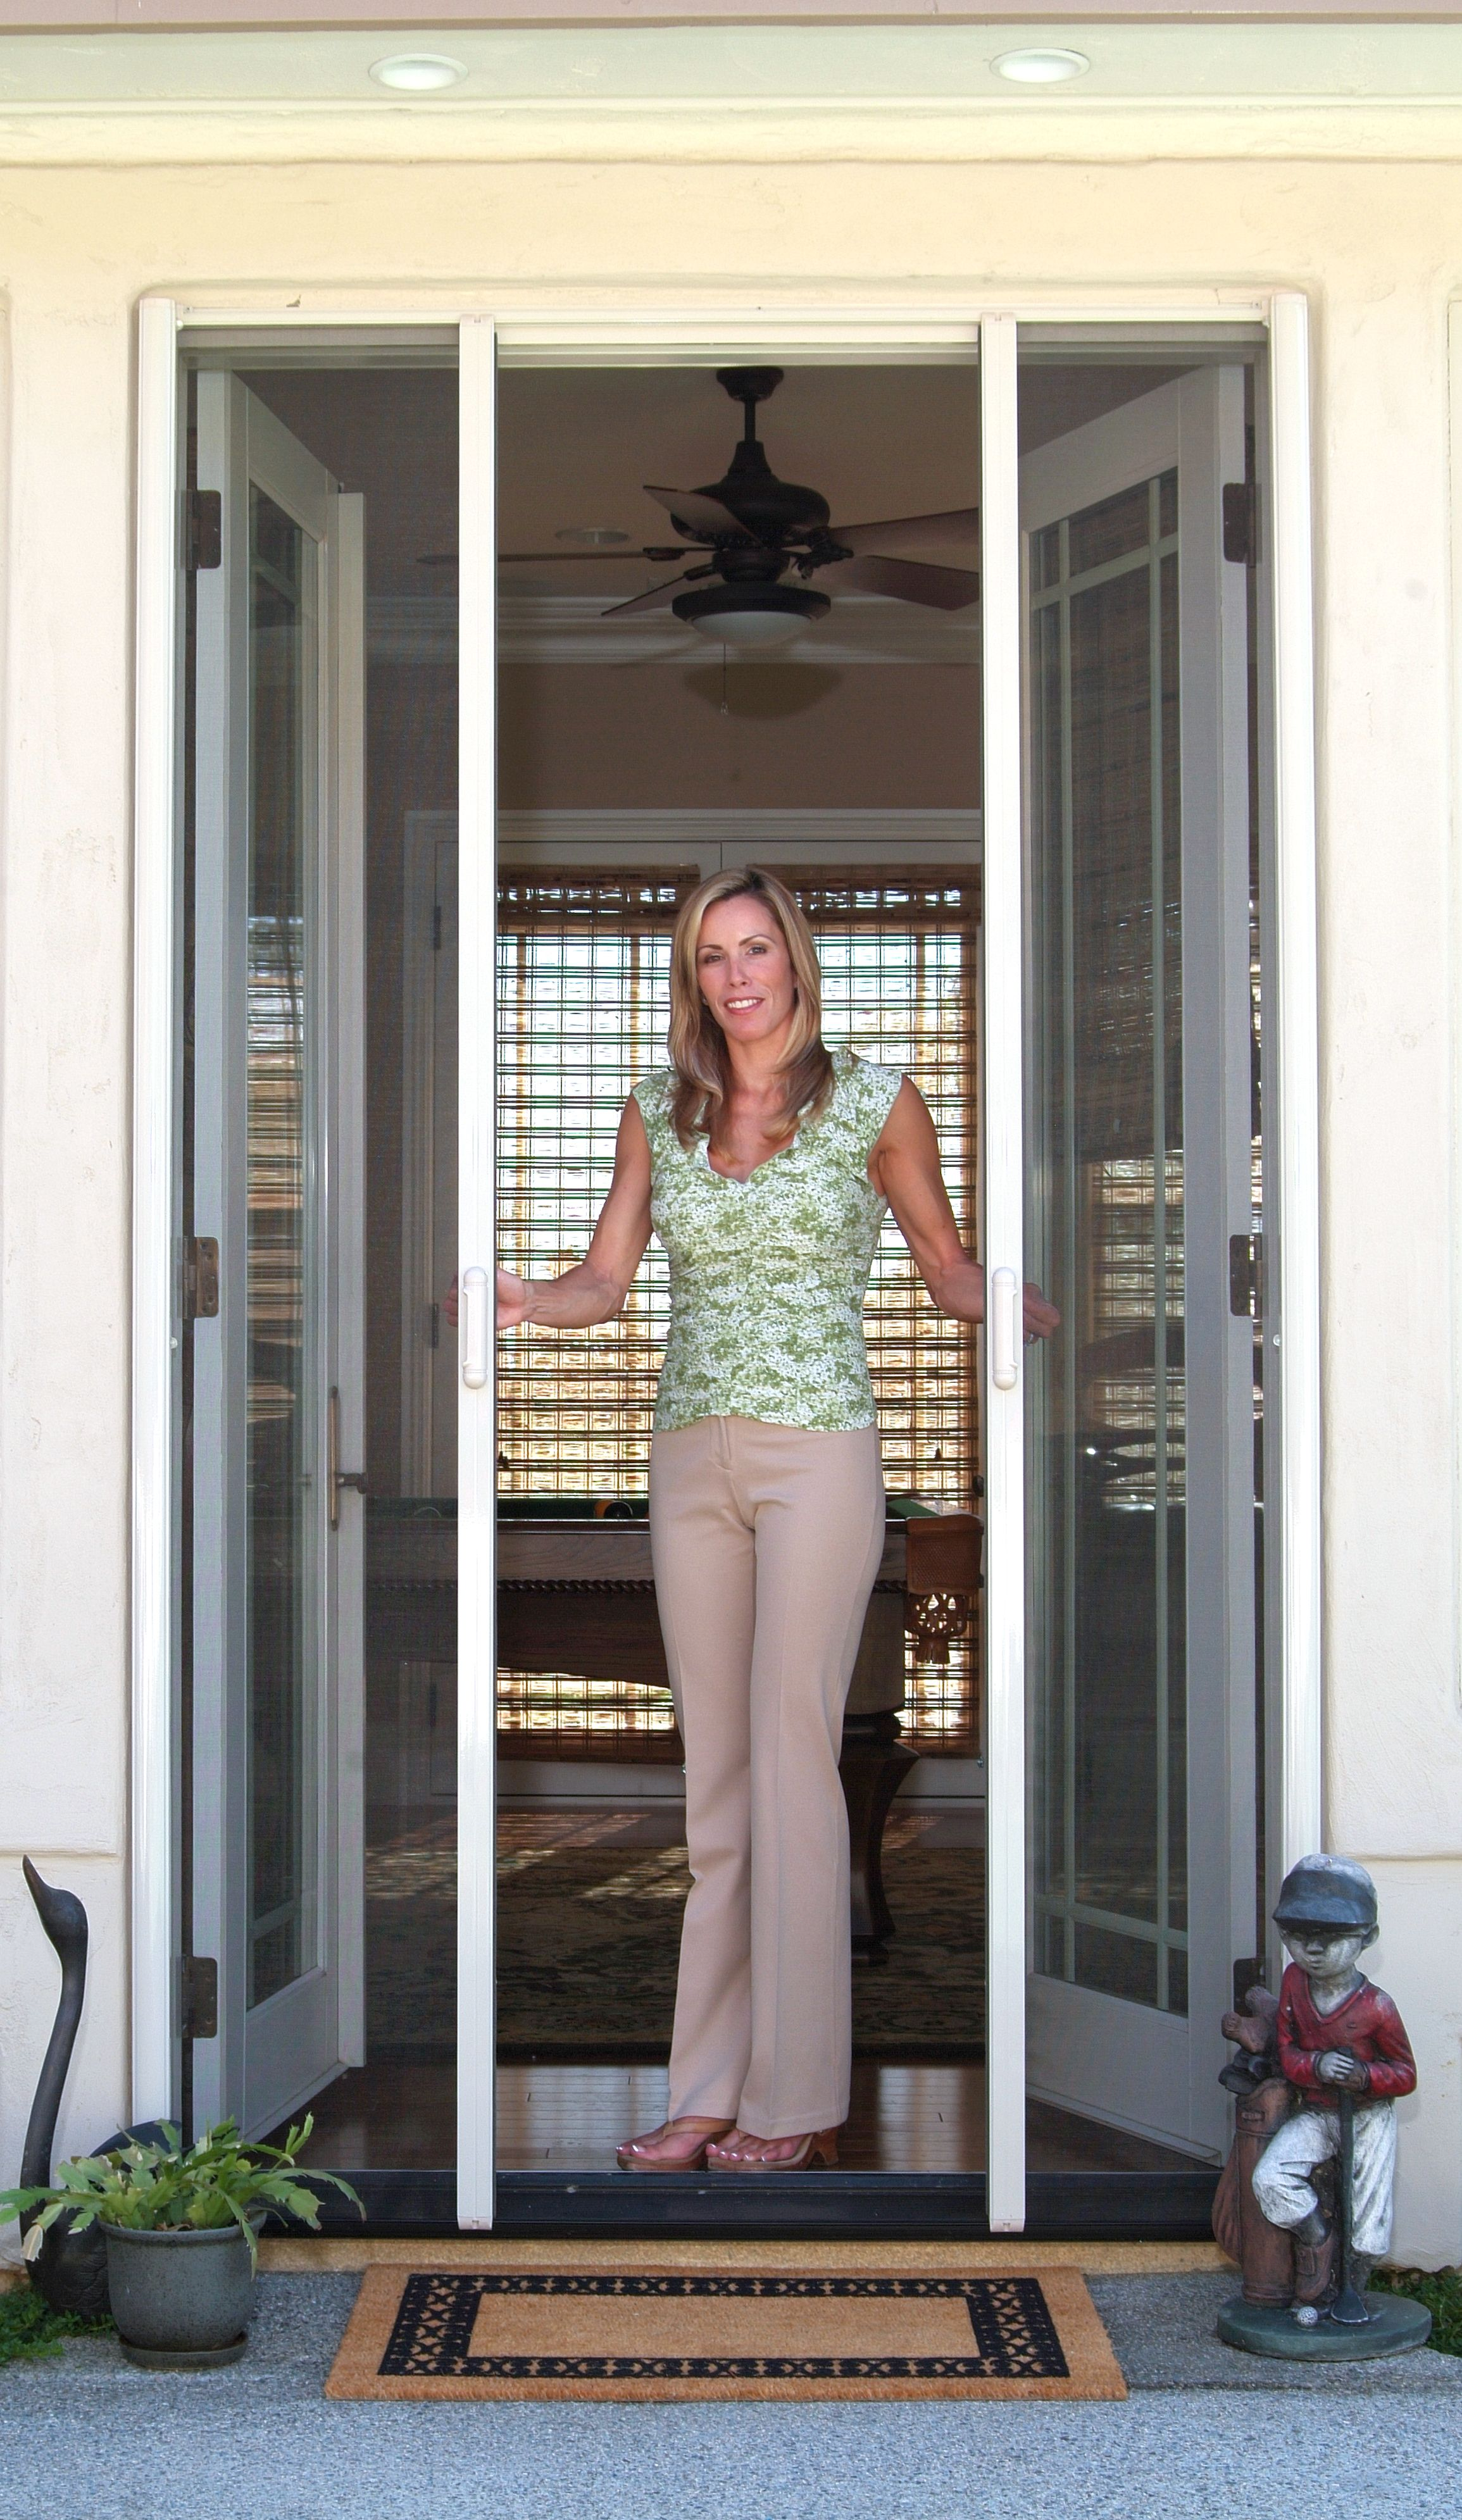 Retractable Screen Door Reviews Retractable Screen Door Retractable Screen French Doors With Screens